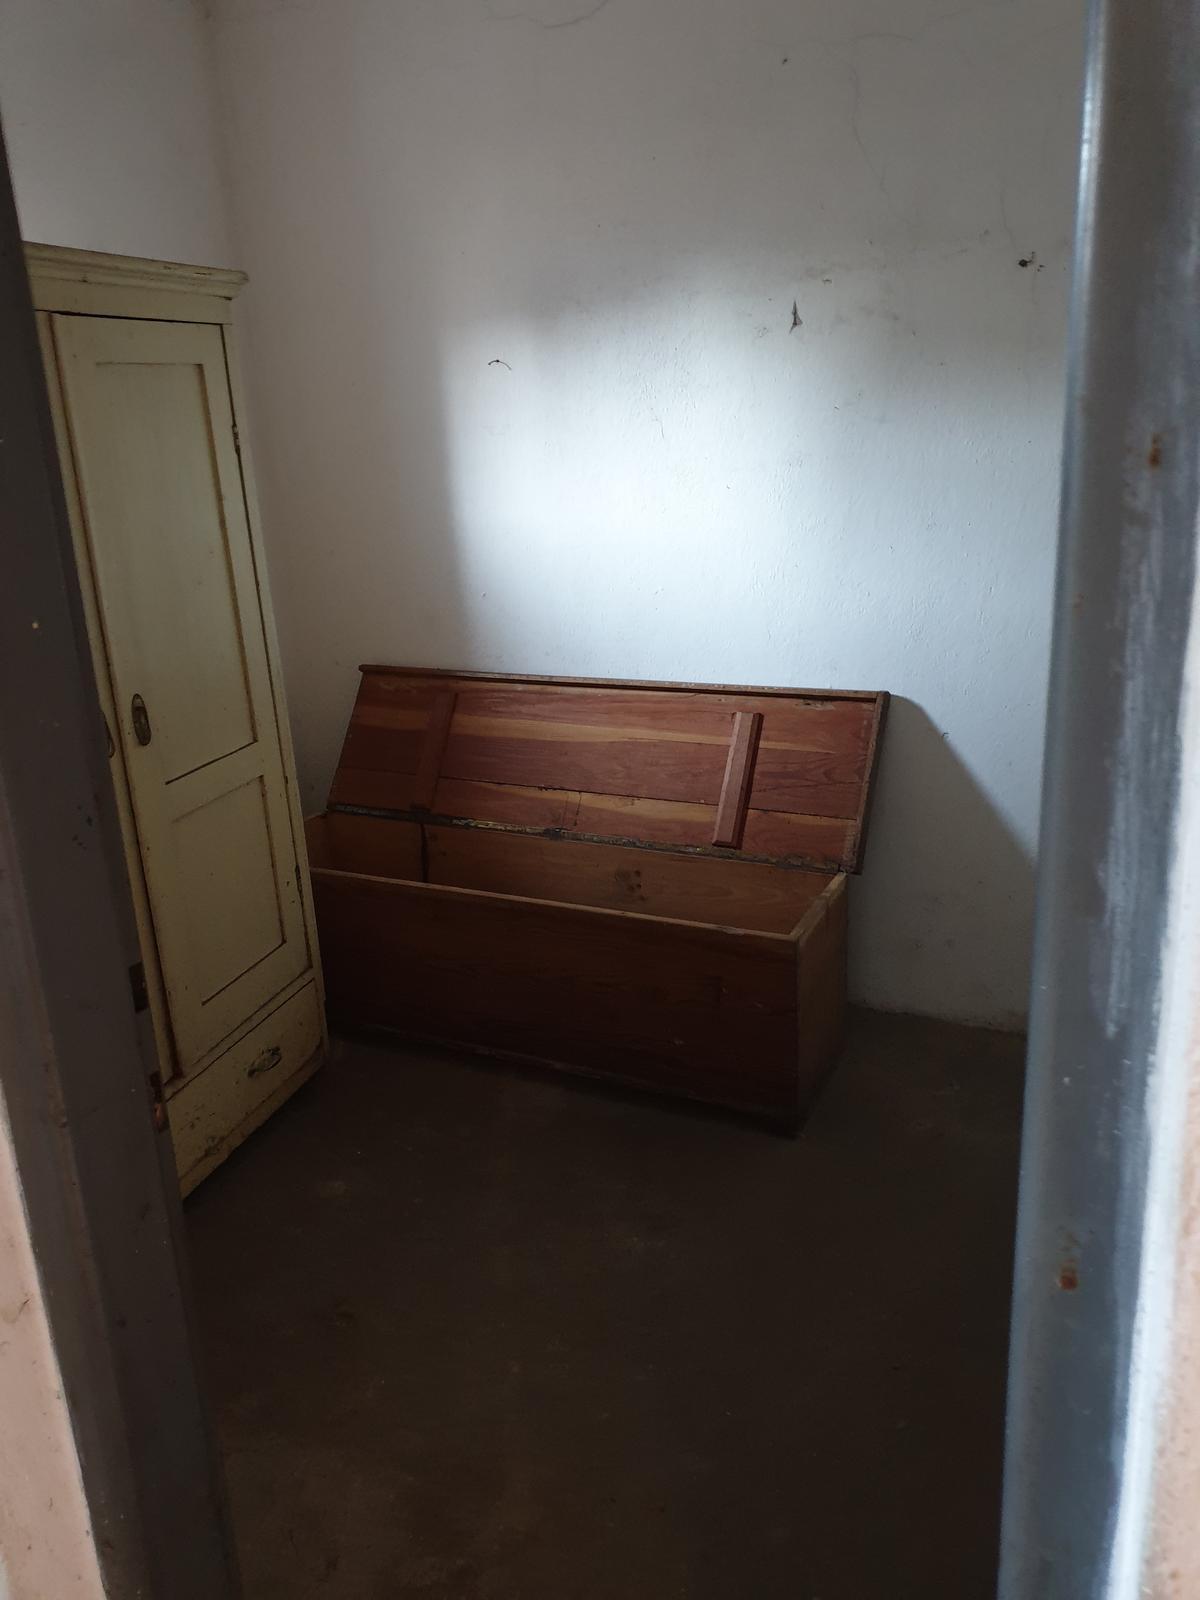 Rekonštrukcia domu-alebo chceme si splniť sen =》🏠🌻🌼🐶  mat domcek a vratit sa na Slovensko - buduca kupelna